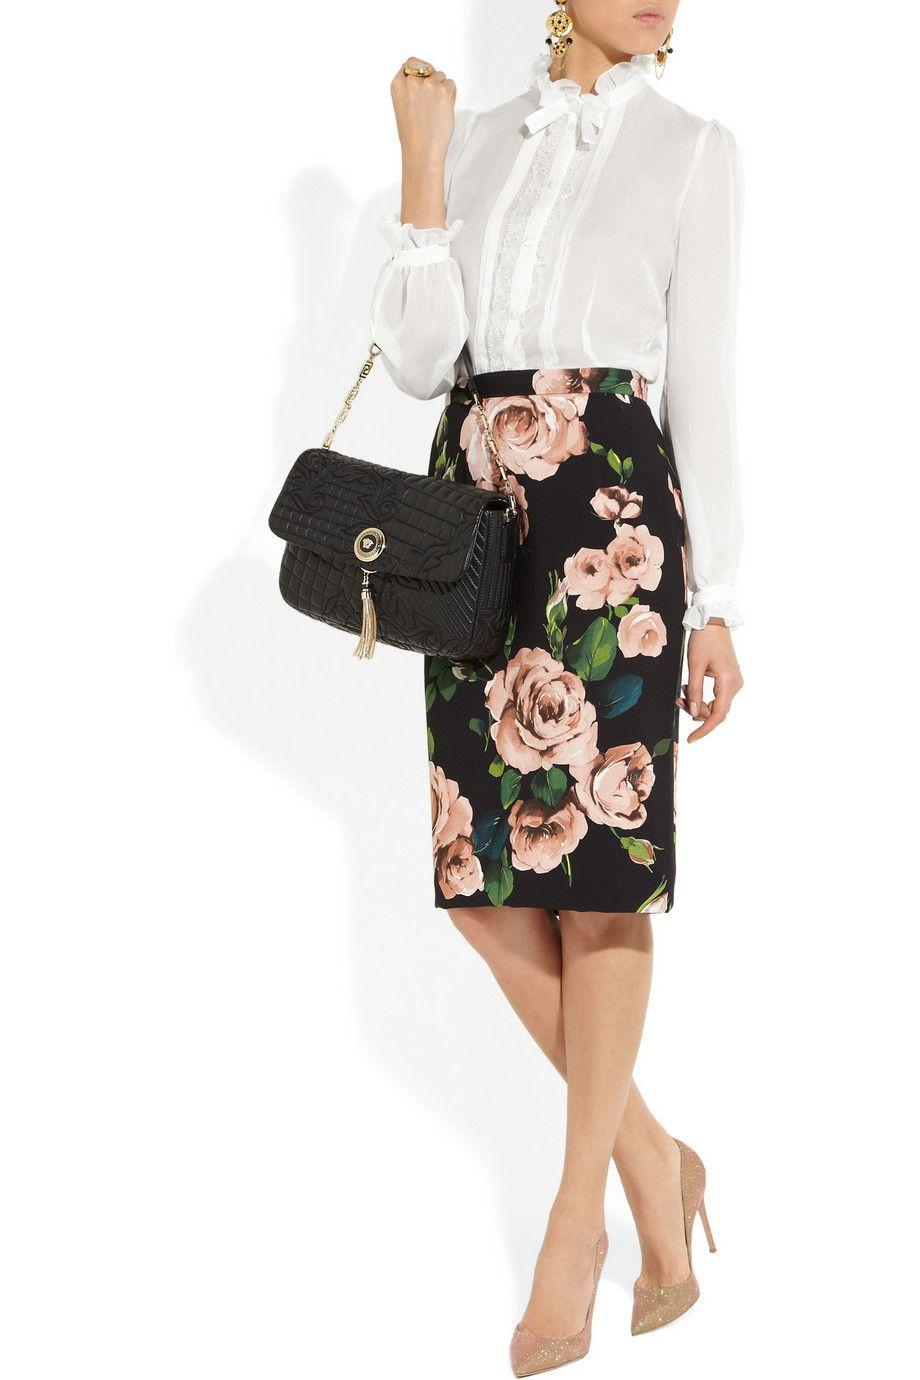 Dolce & Gabbana|Lace-trimmed silk-chiffon blouse|NET-A-PORTER.COM